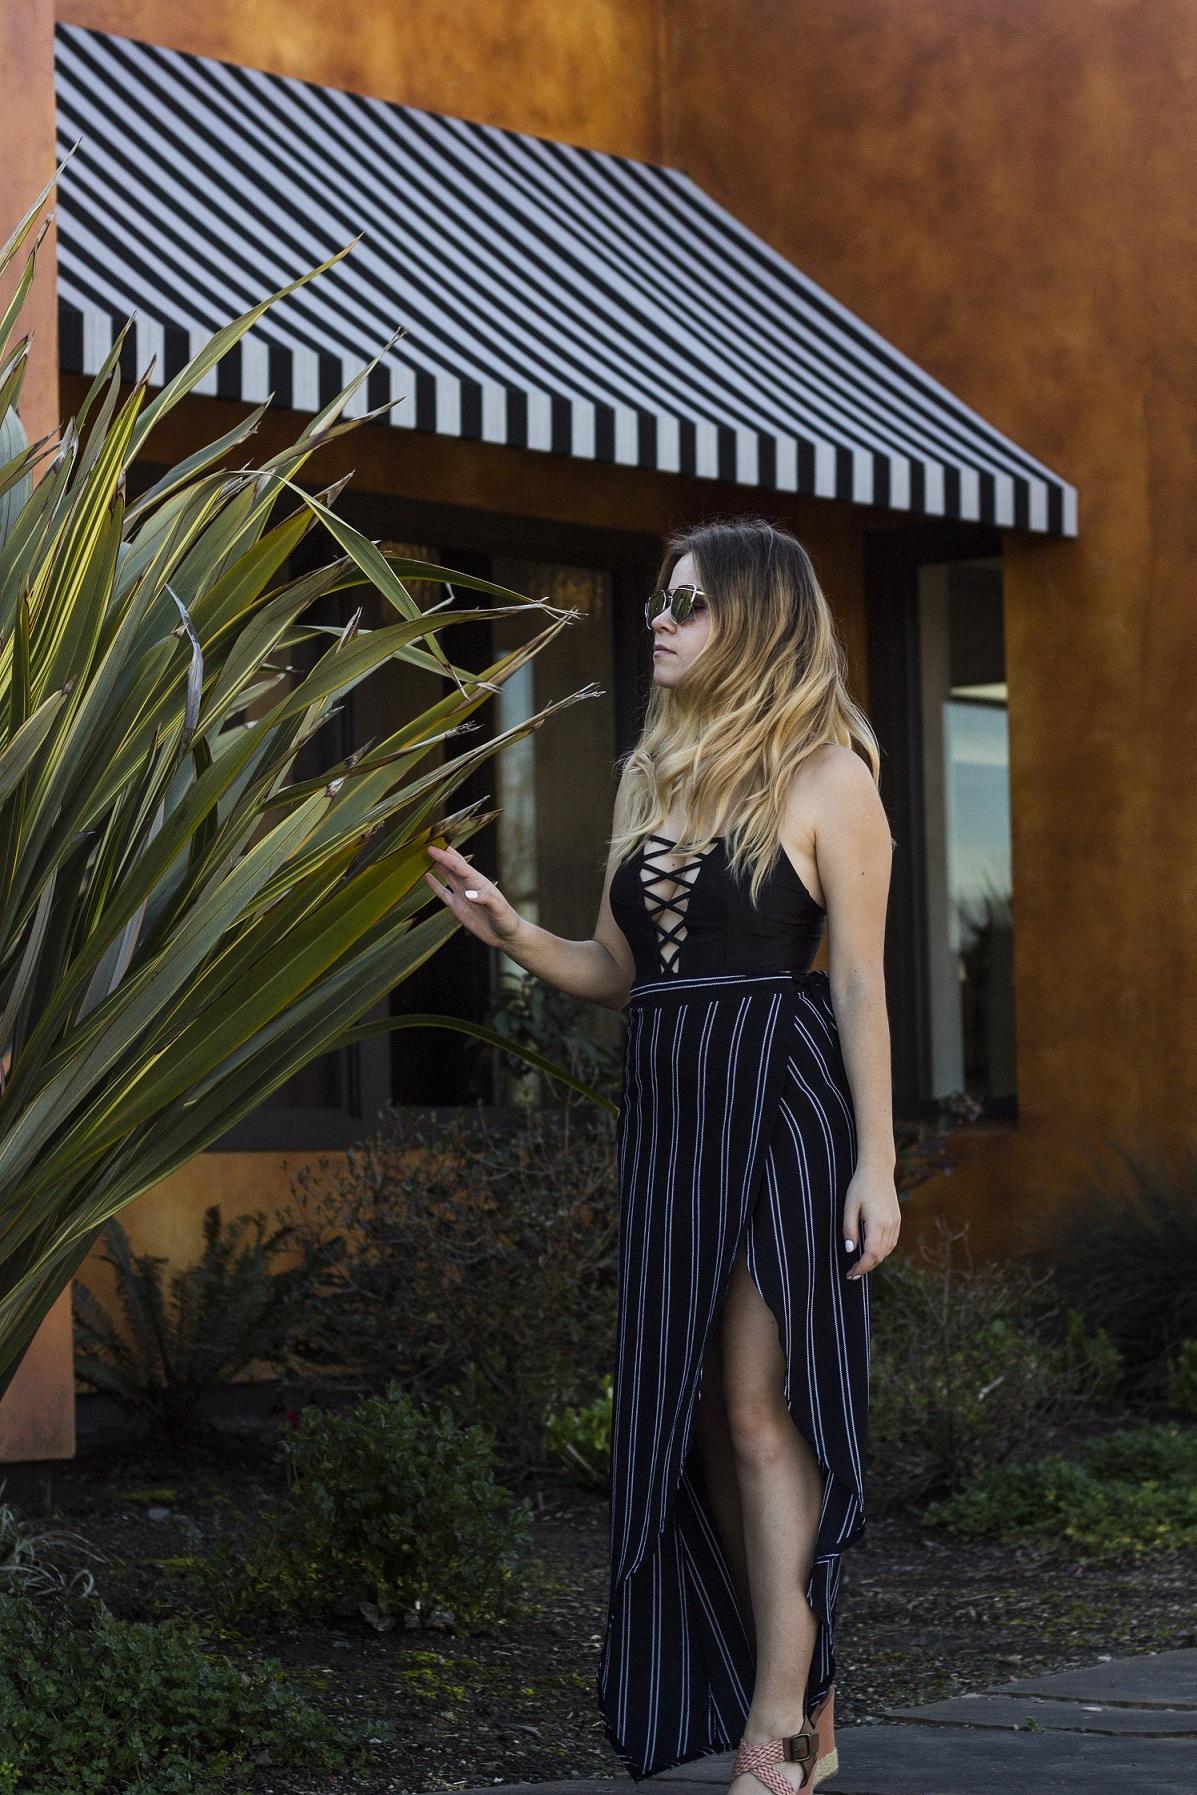 Zaful girl fashion blogger lace up swimsuit